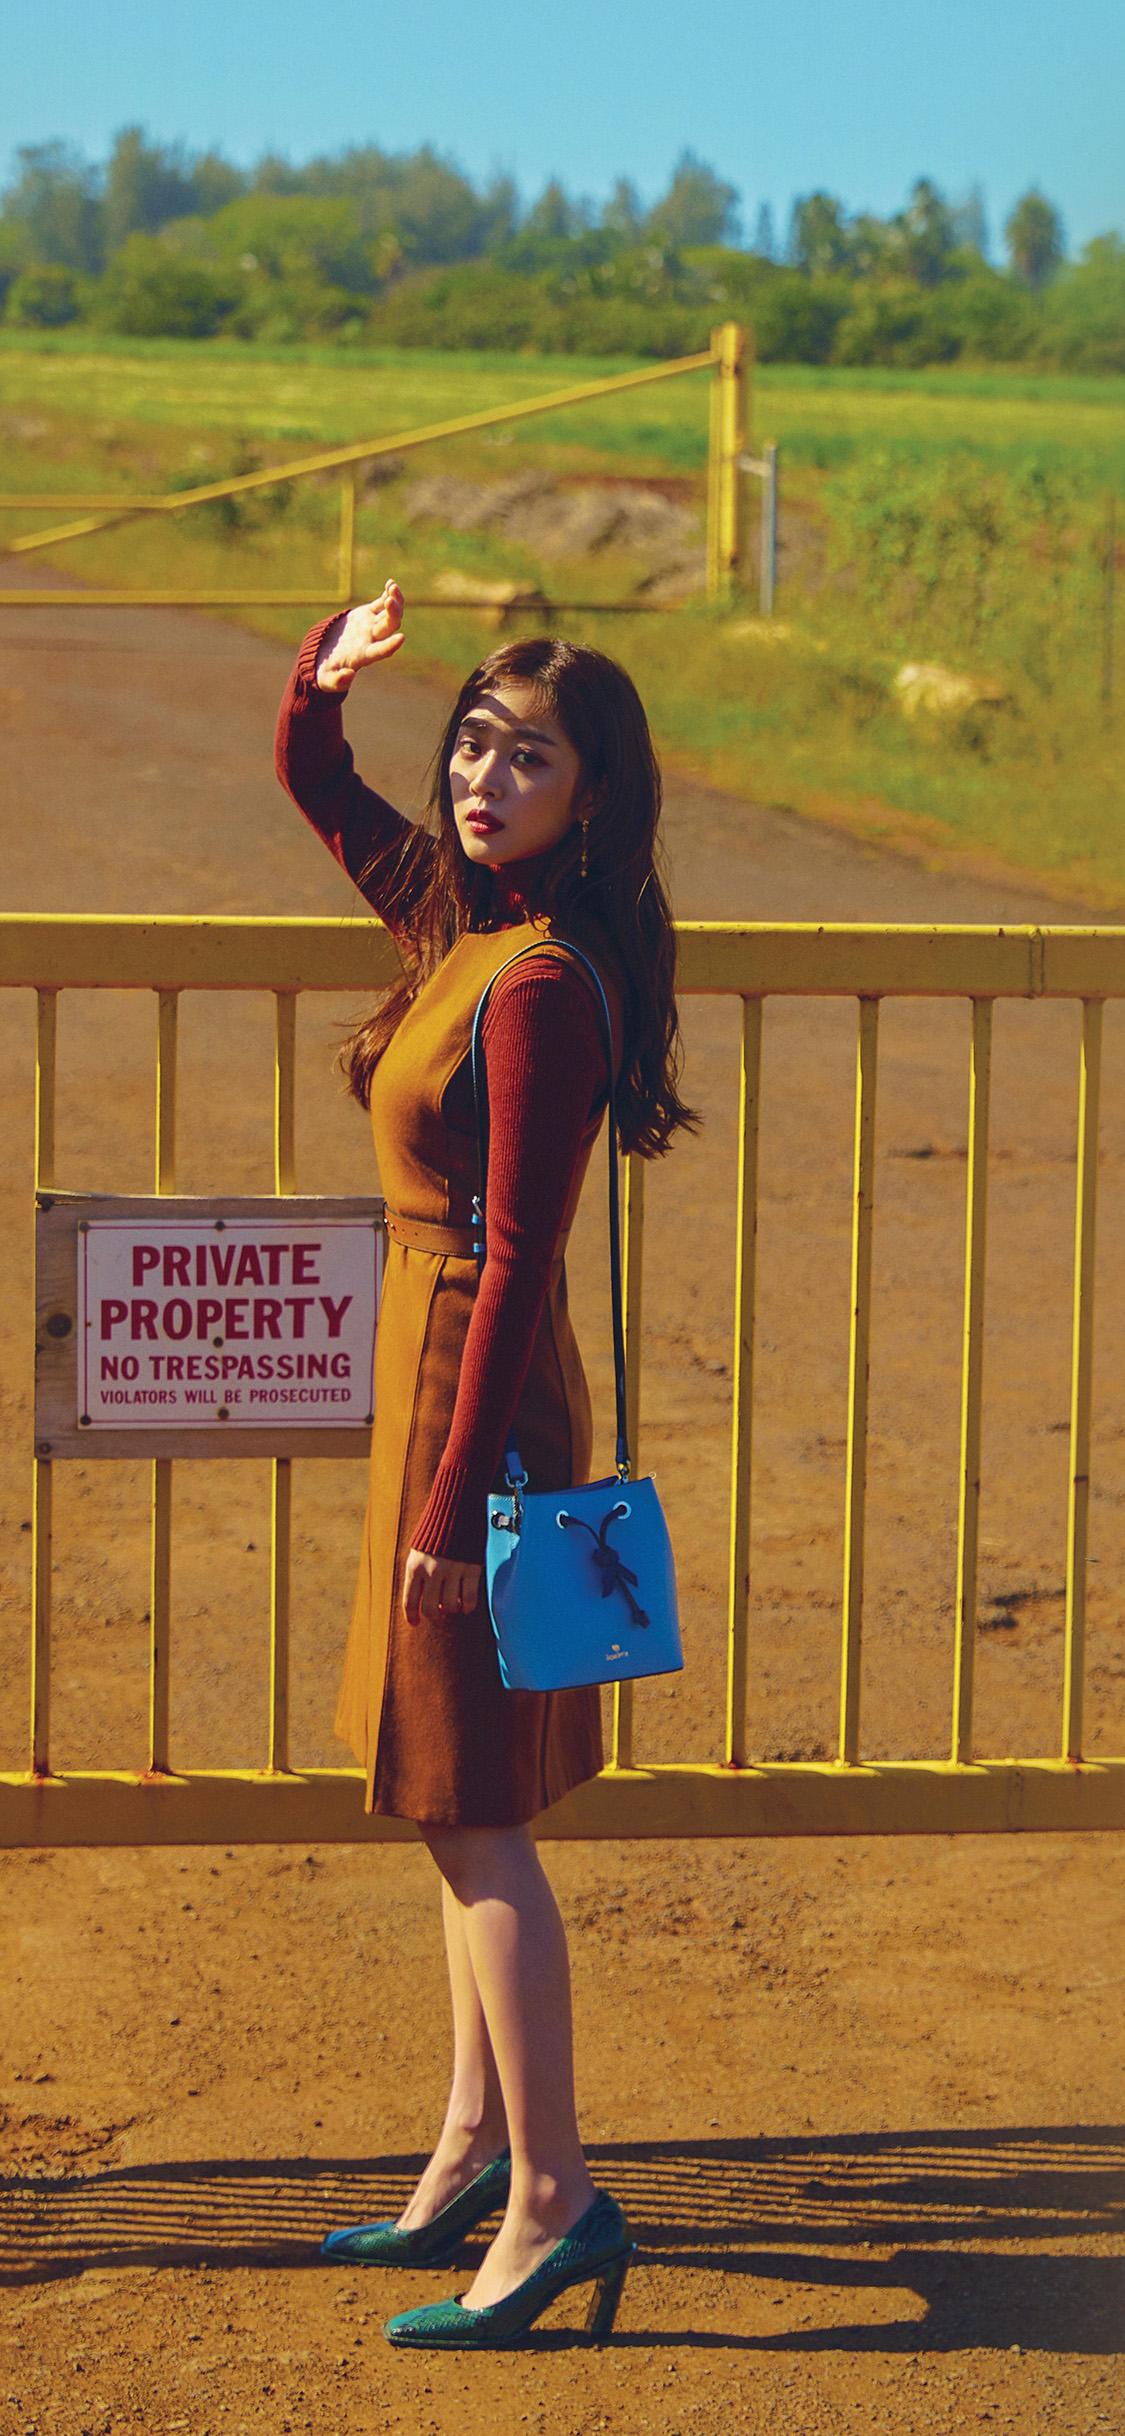 iPhonexpapers.com-Apple-iPhone-wallpaper-hs73-kpop-girl-asian-summer-sunny-street-orange